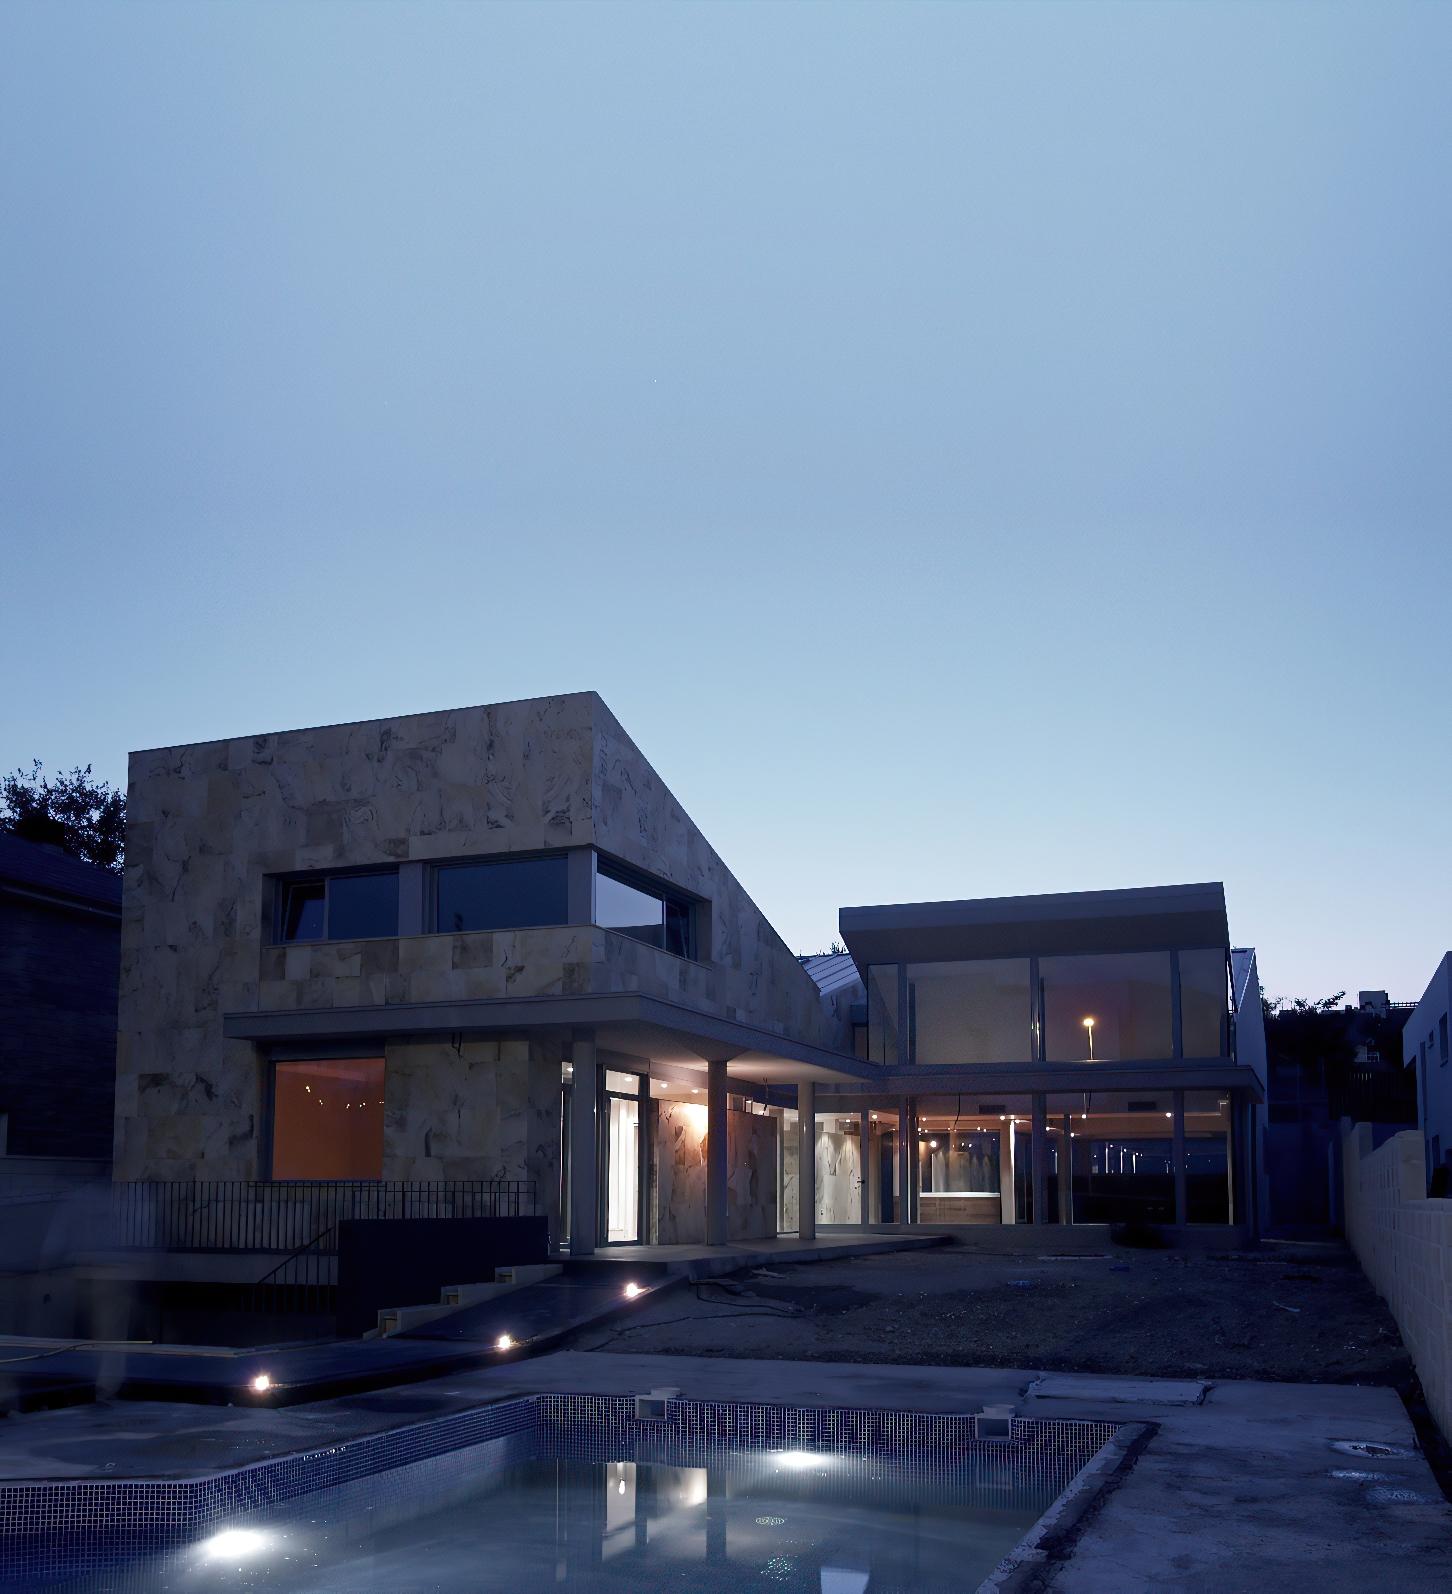 Casa de Valdemoro AtGestion Estudio de Arquitectura e interiorismo Madrid Perfect Pixel Publicidad-In-scale-1_00x